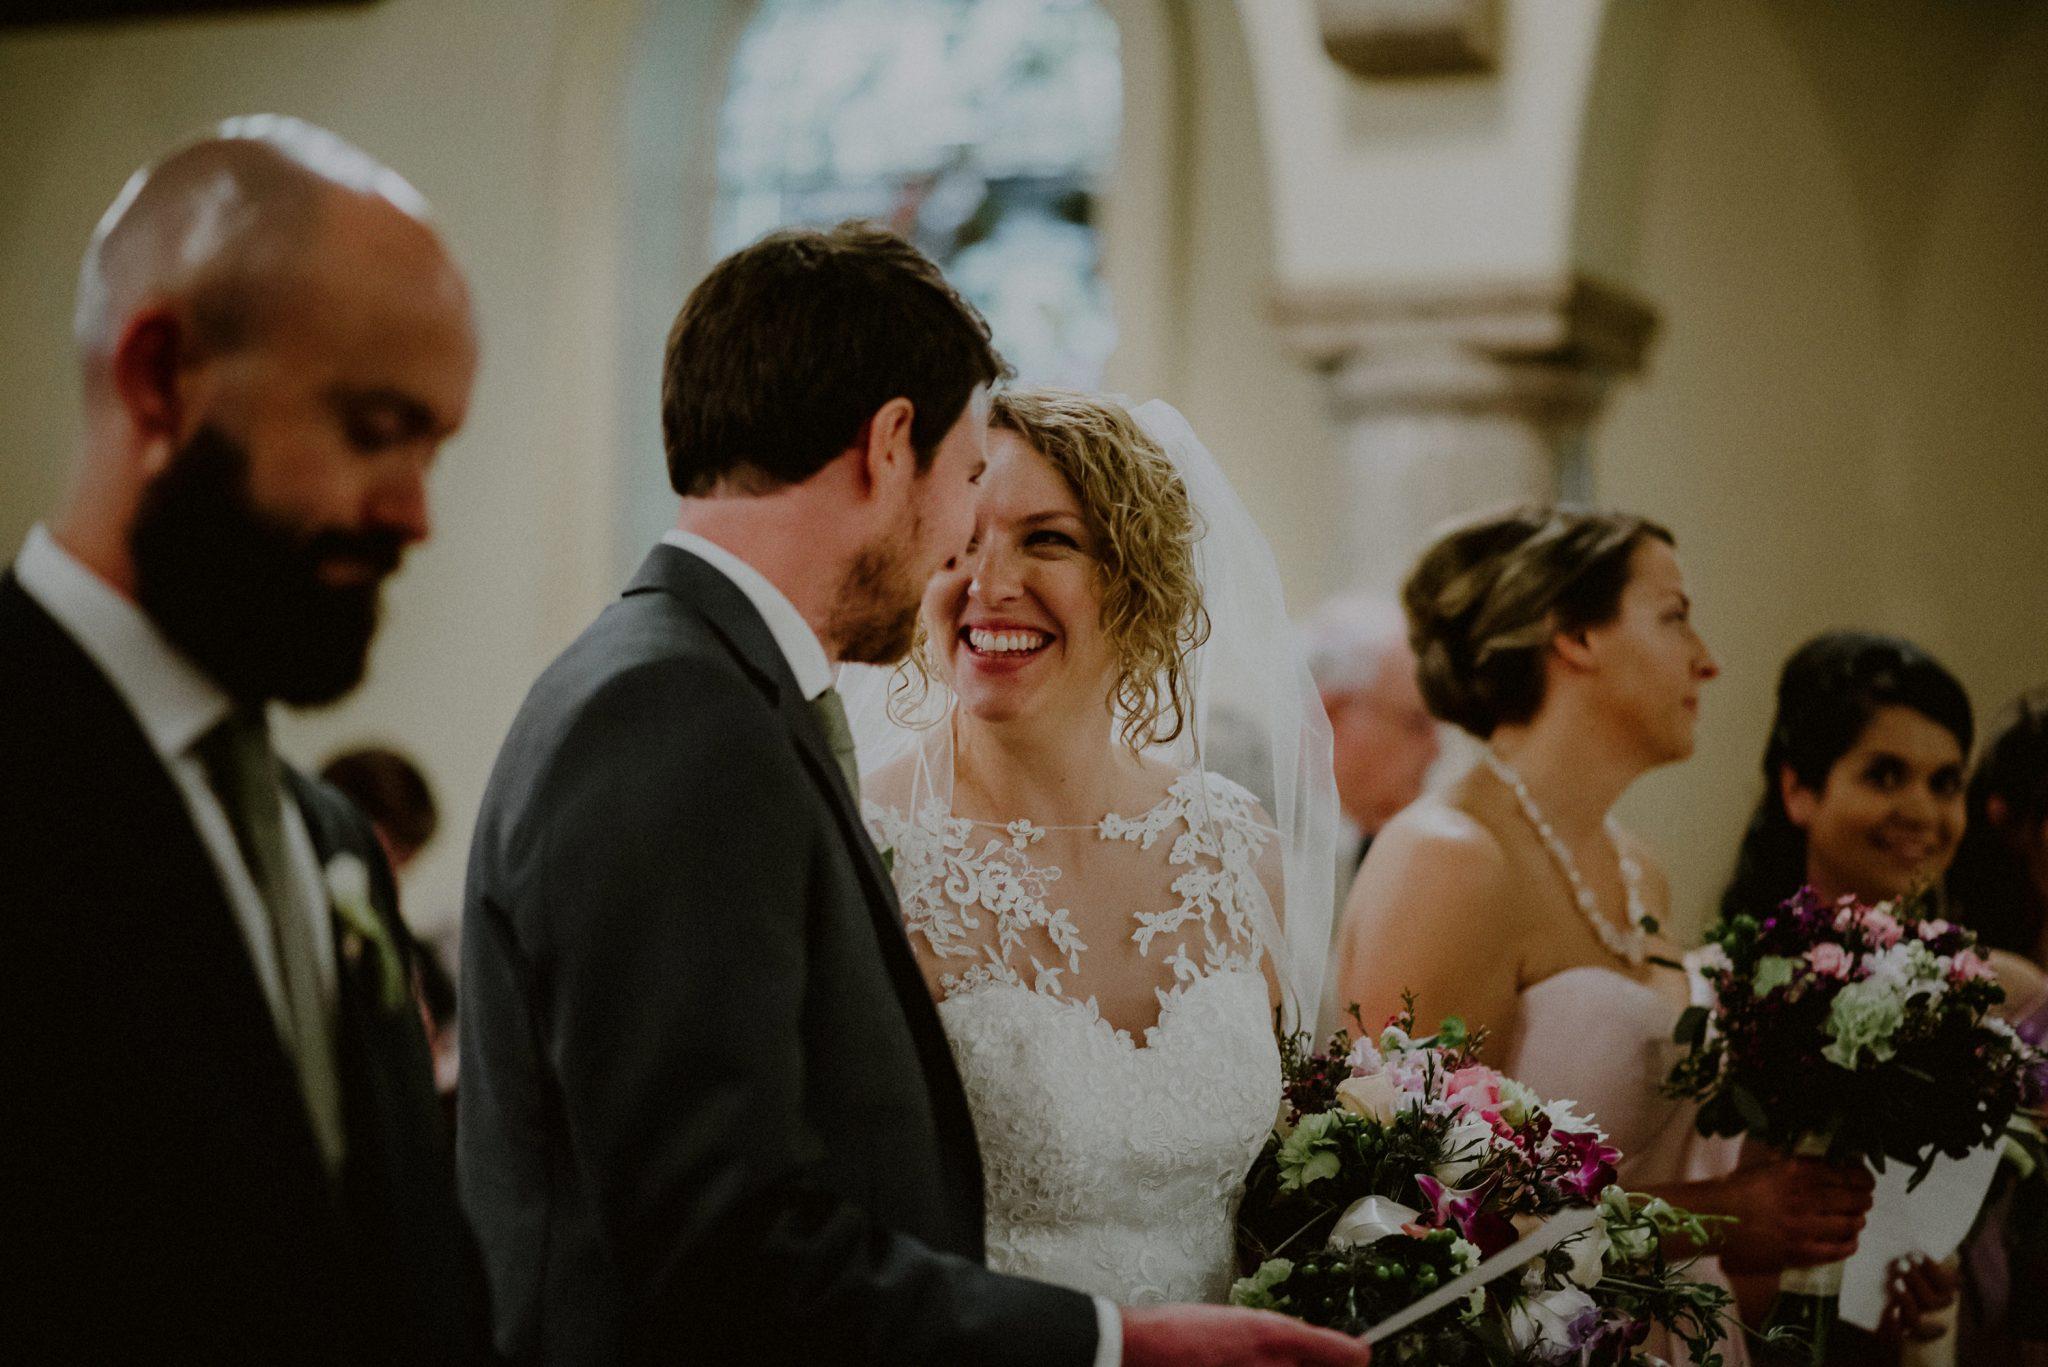 small town wedding photographs